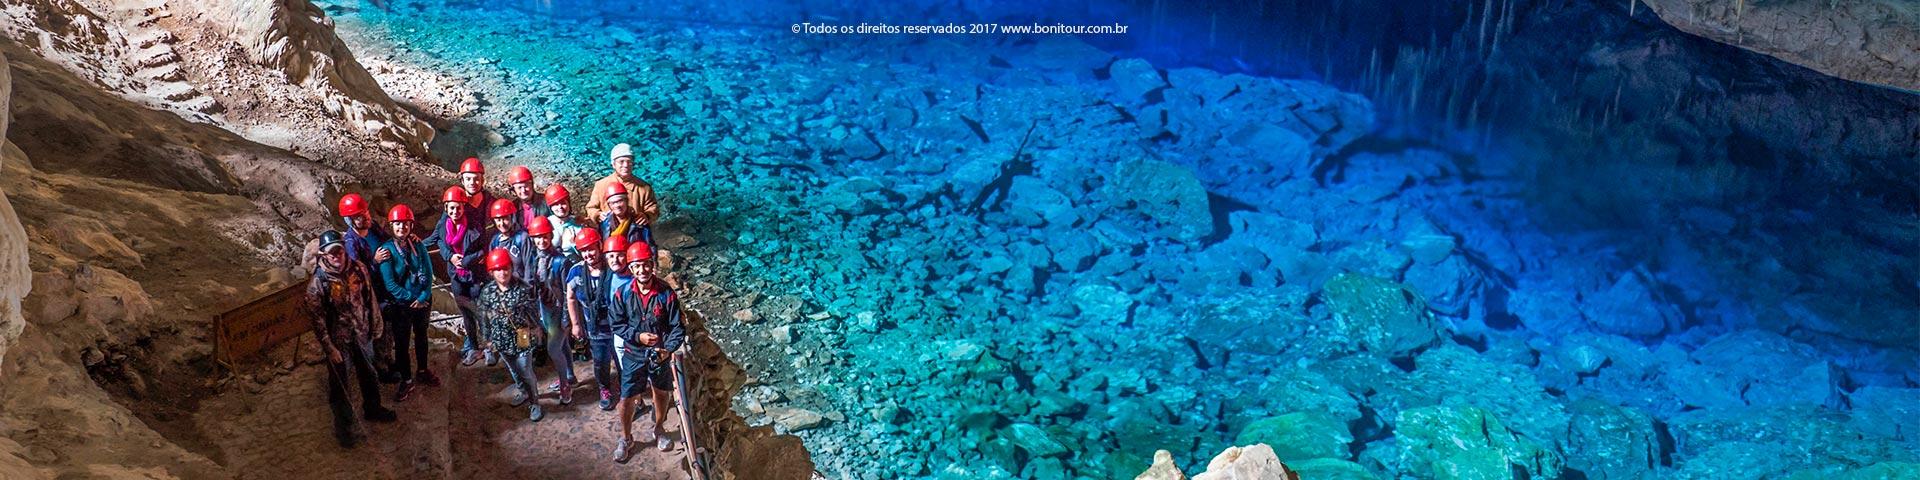 Gruta-do-lago-azul-Bonitour-Passeios-em-Bonito-MS-1108_2355.jpg